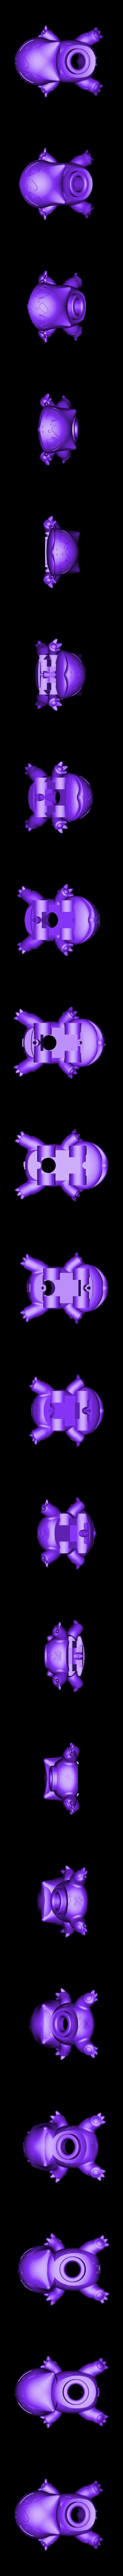 bulbasaurPBC-body_freedownload.stl Download free STL file Pokémon - Bulbasaur pull back car toy • 3D printing model, cycstudio